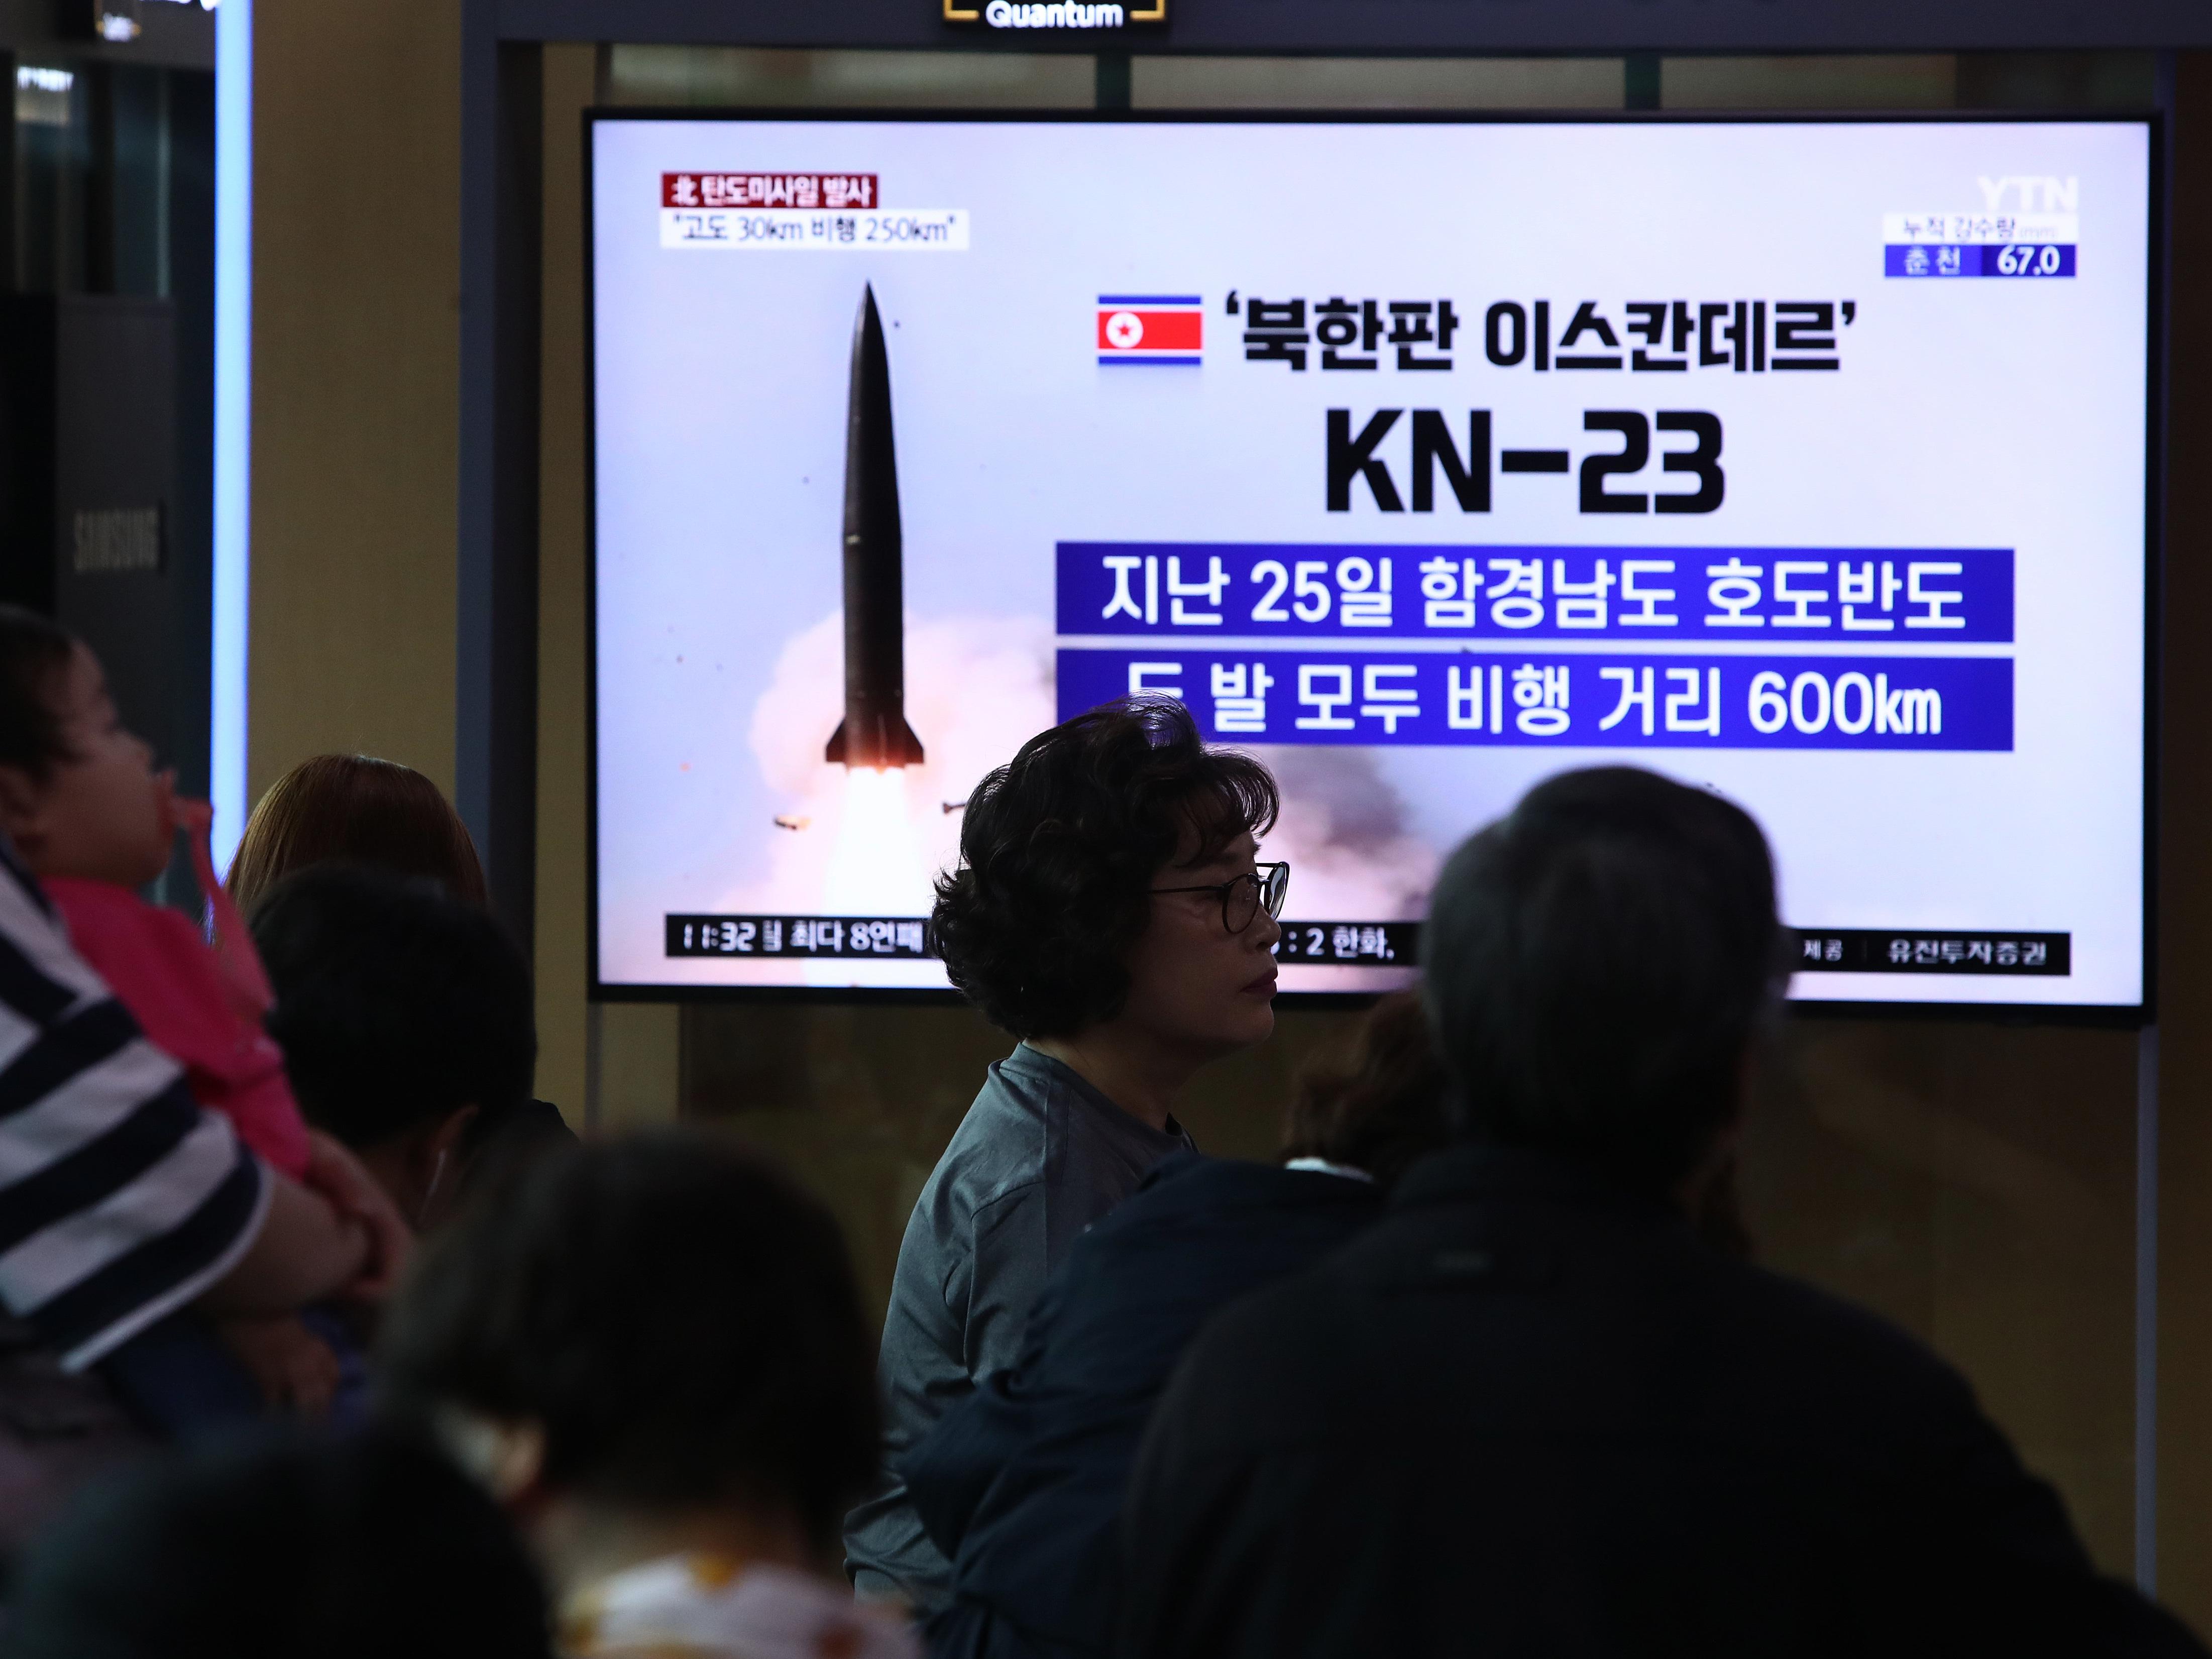 North Korea Conducts 3rd Missile Test Since Last Week Amid